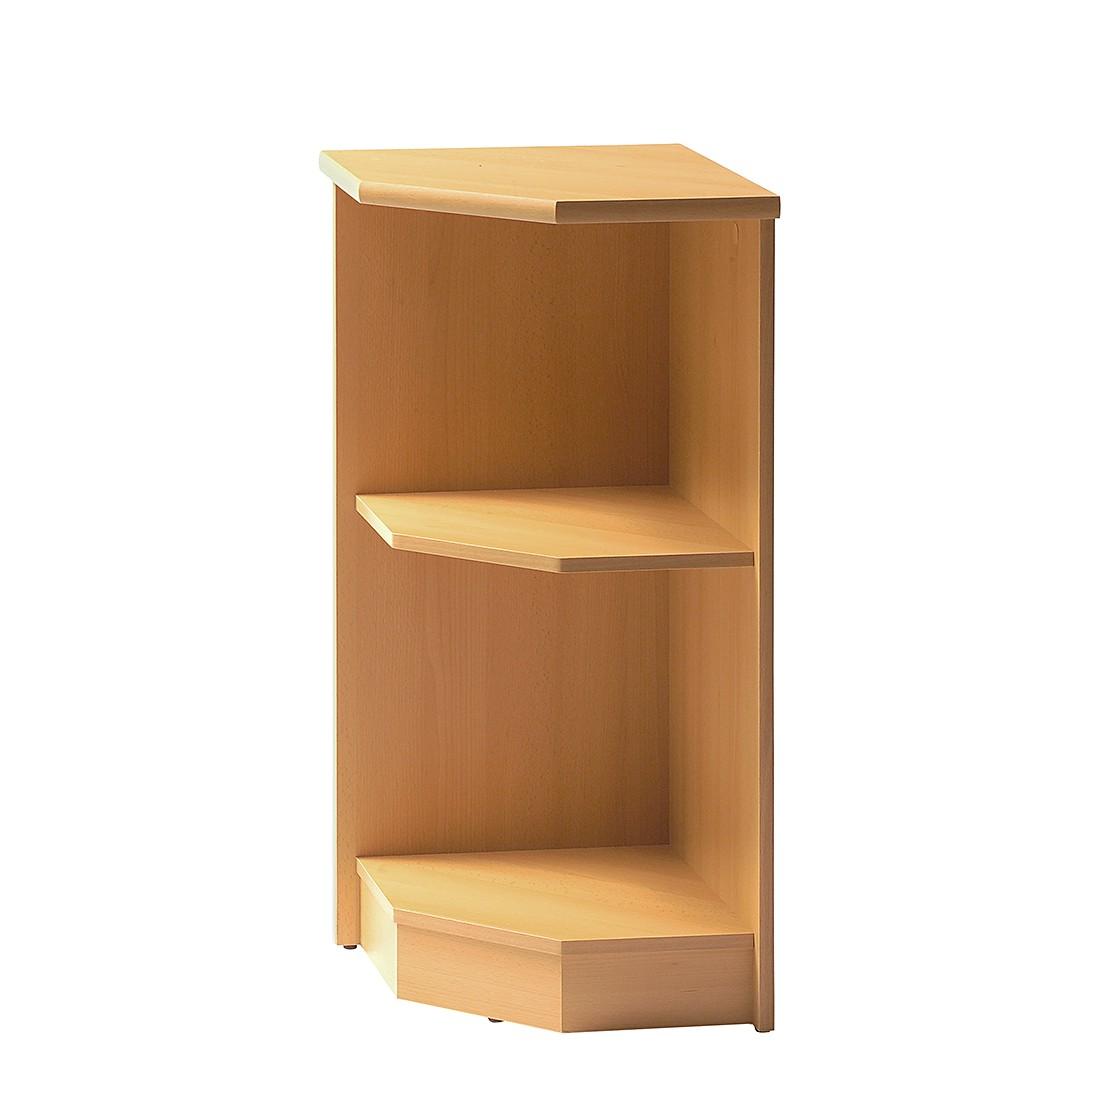 eckregal buche preis vergleich 2016 preisvergleicheu. Black Bedroom Furniture Sets. Home Design Ideas